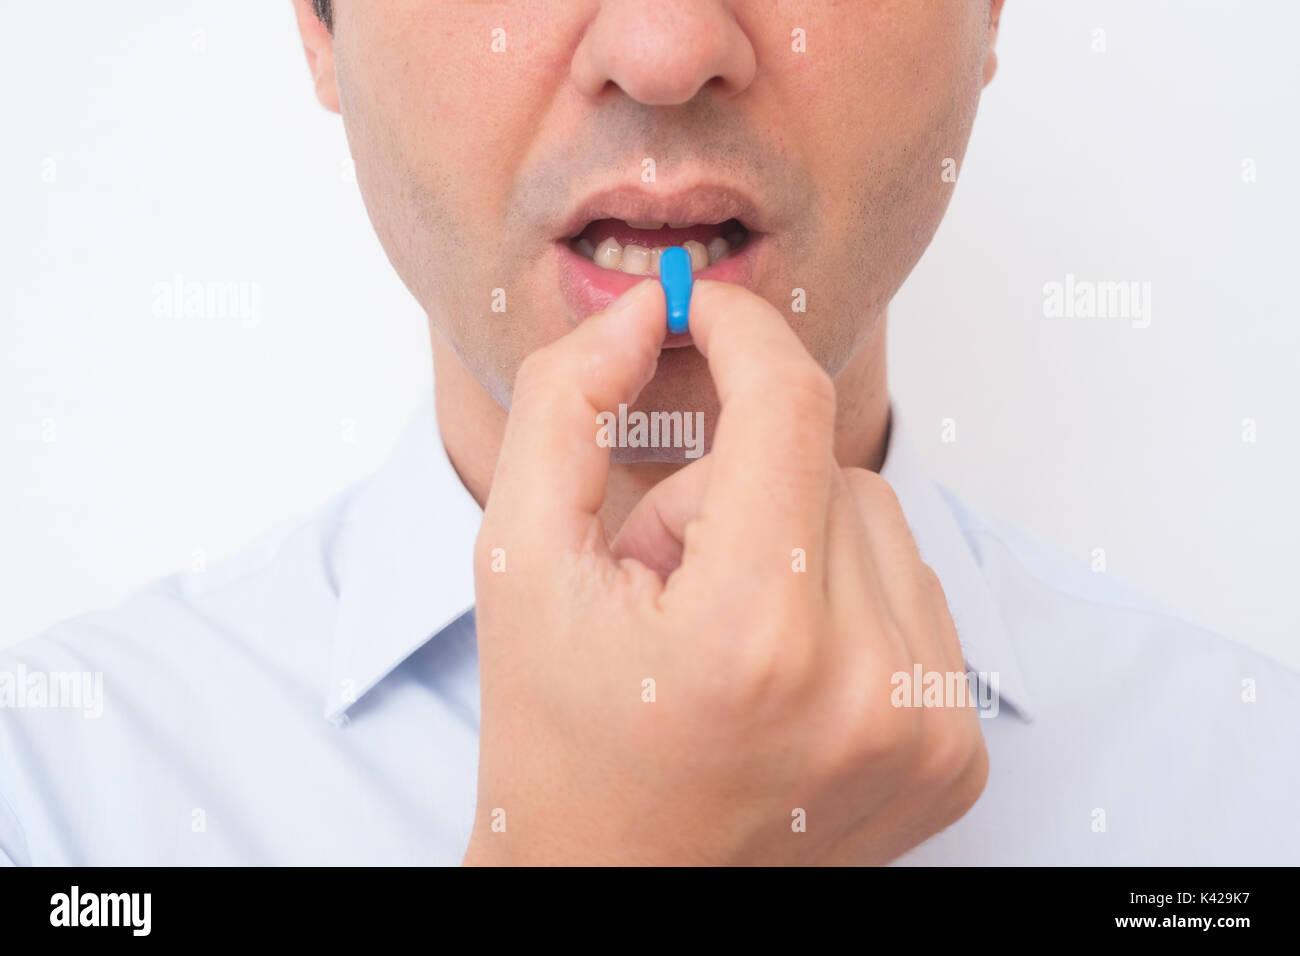 Head of sick man eating blue medicine pill - Stock Image